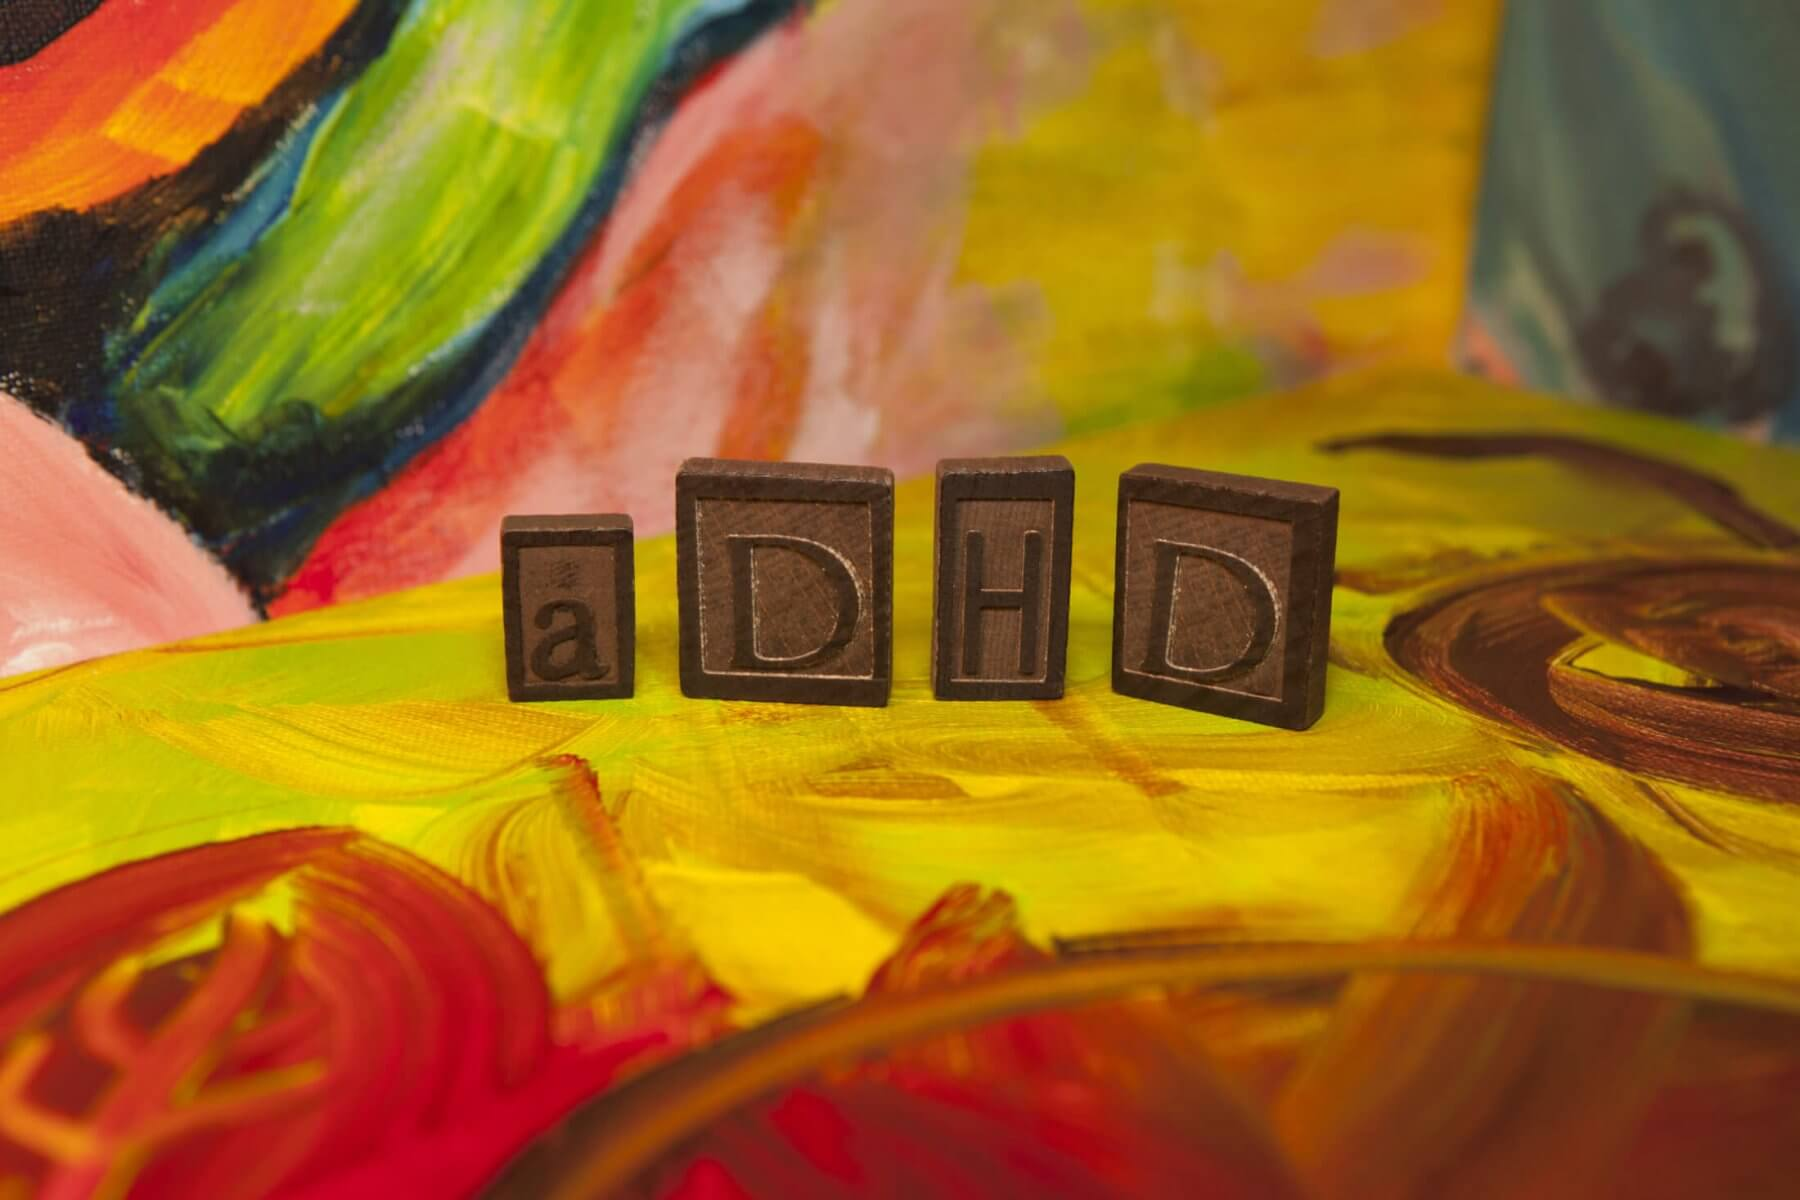 Ritalin: Drug Effects, Addiction, Abuse and Treatment - Rehab Spot